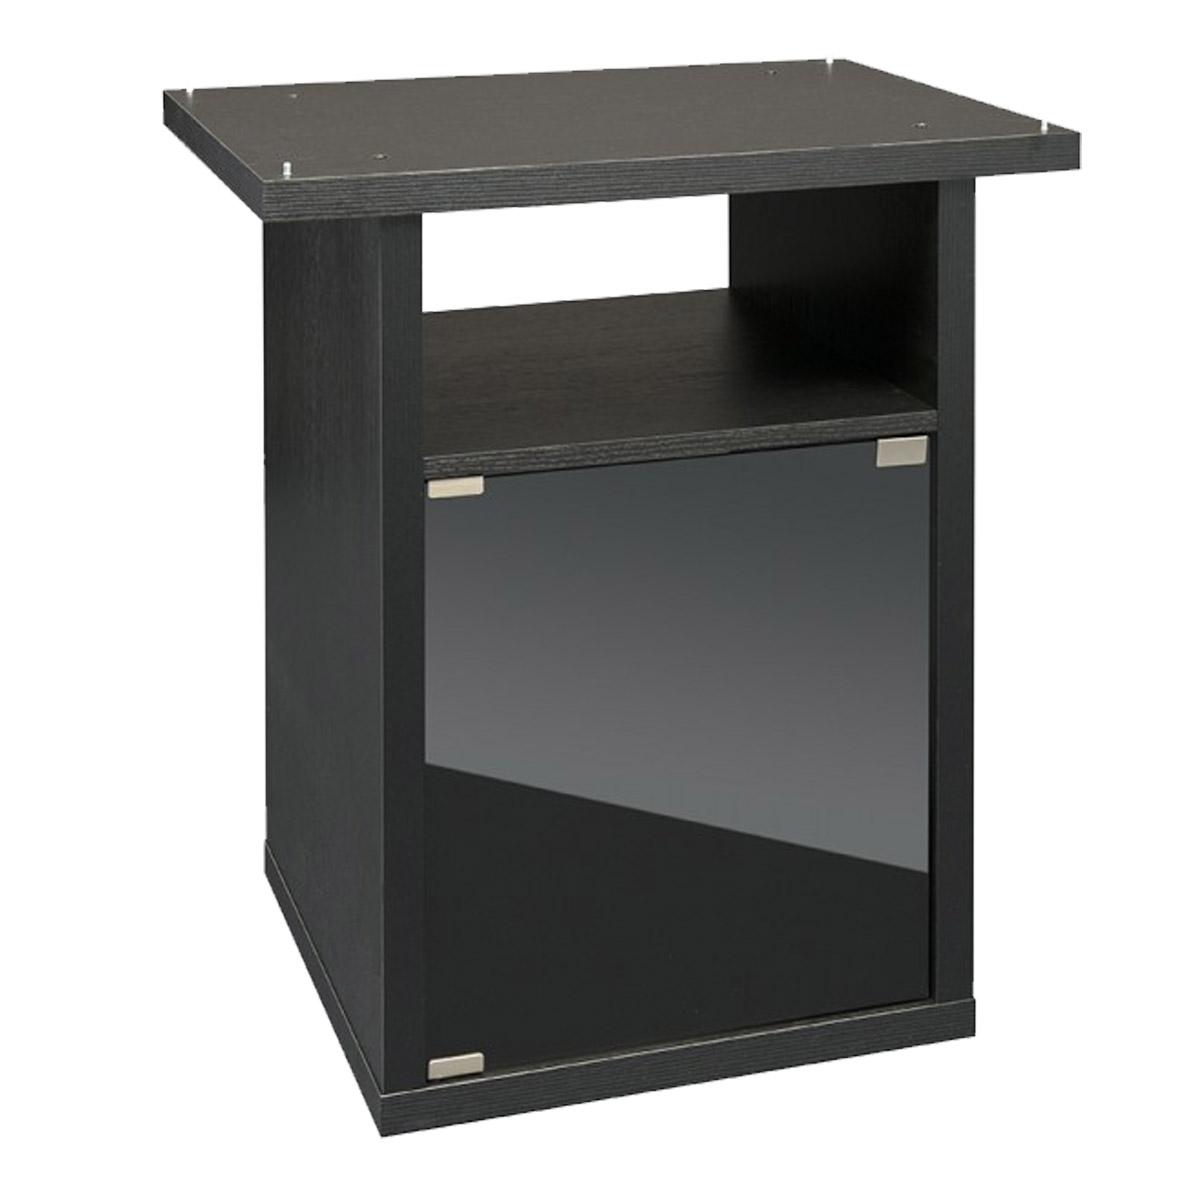 Exo Terra Terrarien Unterschrank Cabinet kaufen bei ZooRoyal